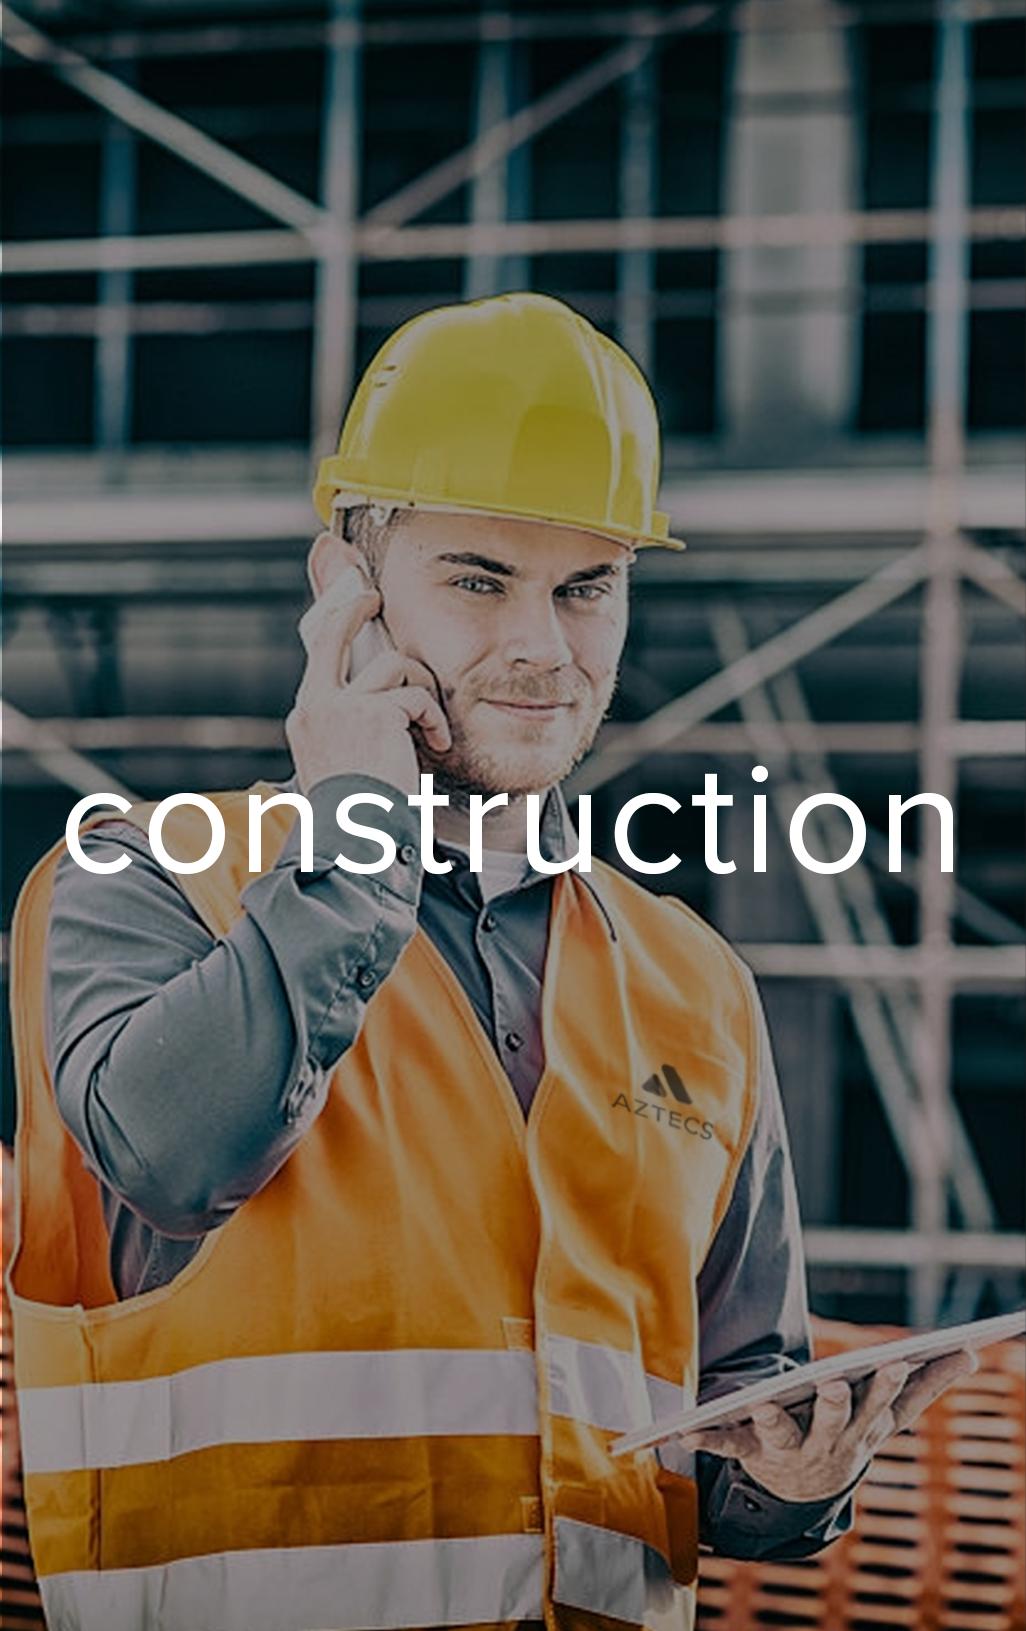 aztecs_civil_construction.png